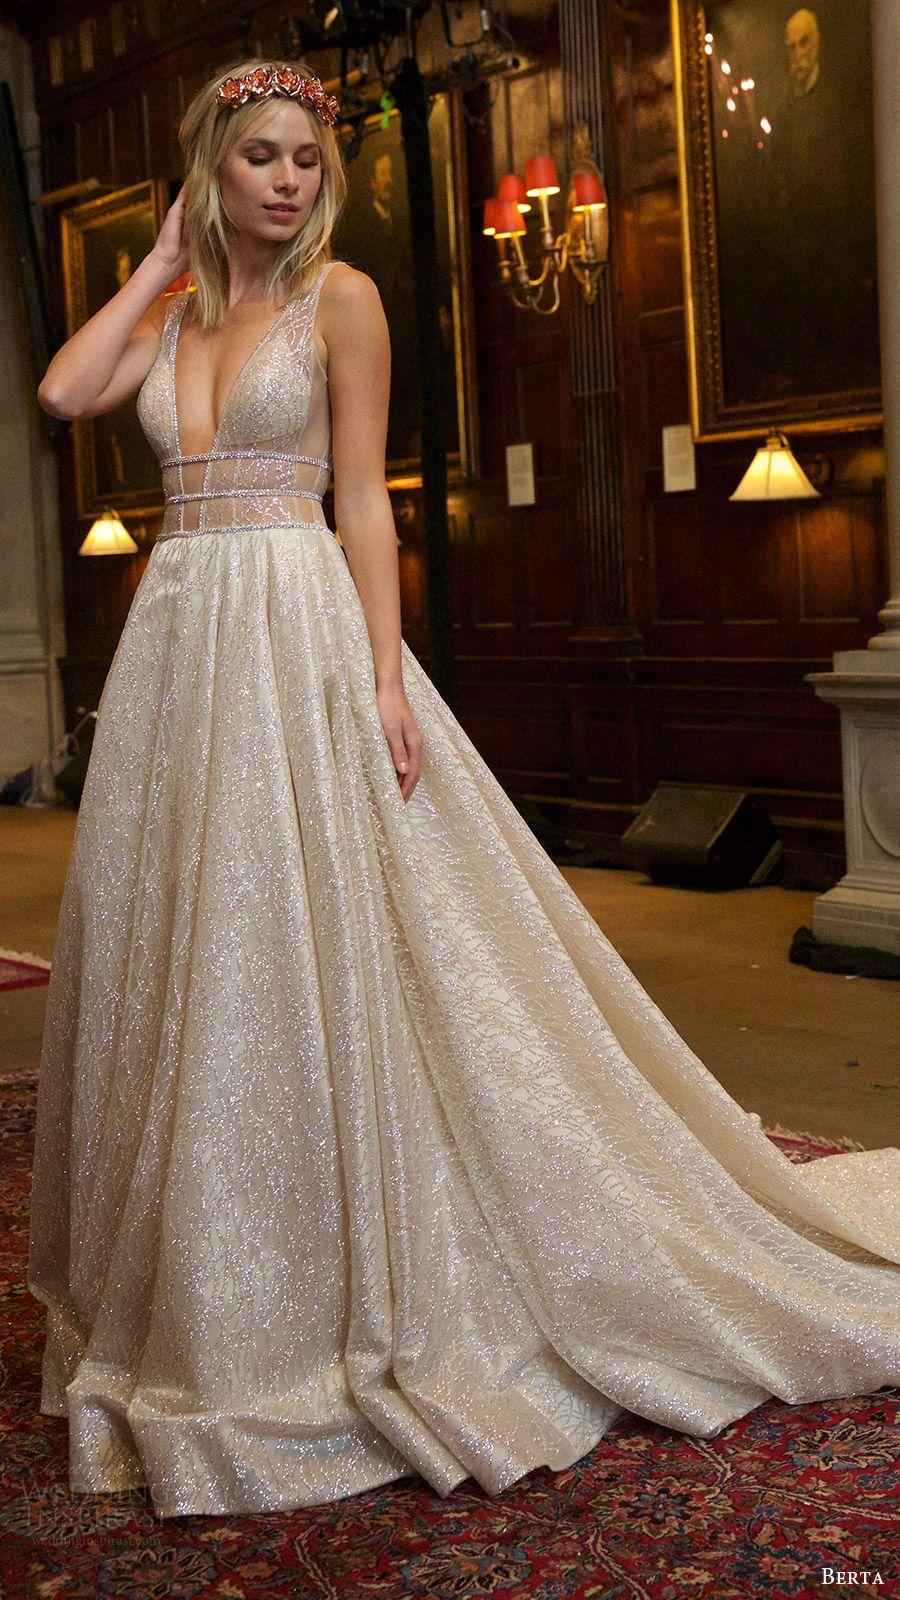 berta bridal fall 2016 deep vneck sleeveless straps ball gown wedding dress (16 101) fv